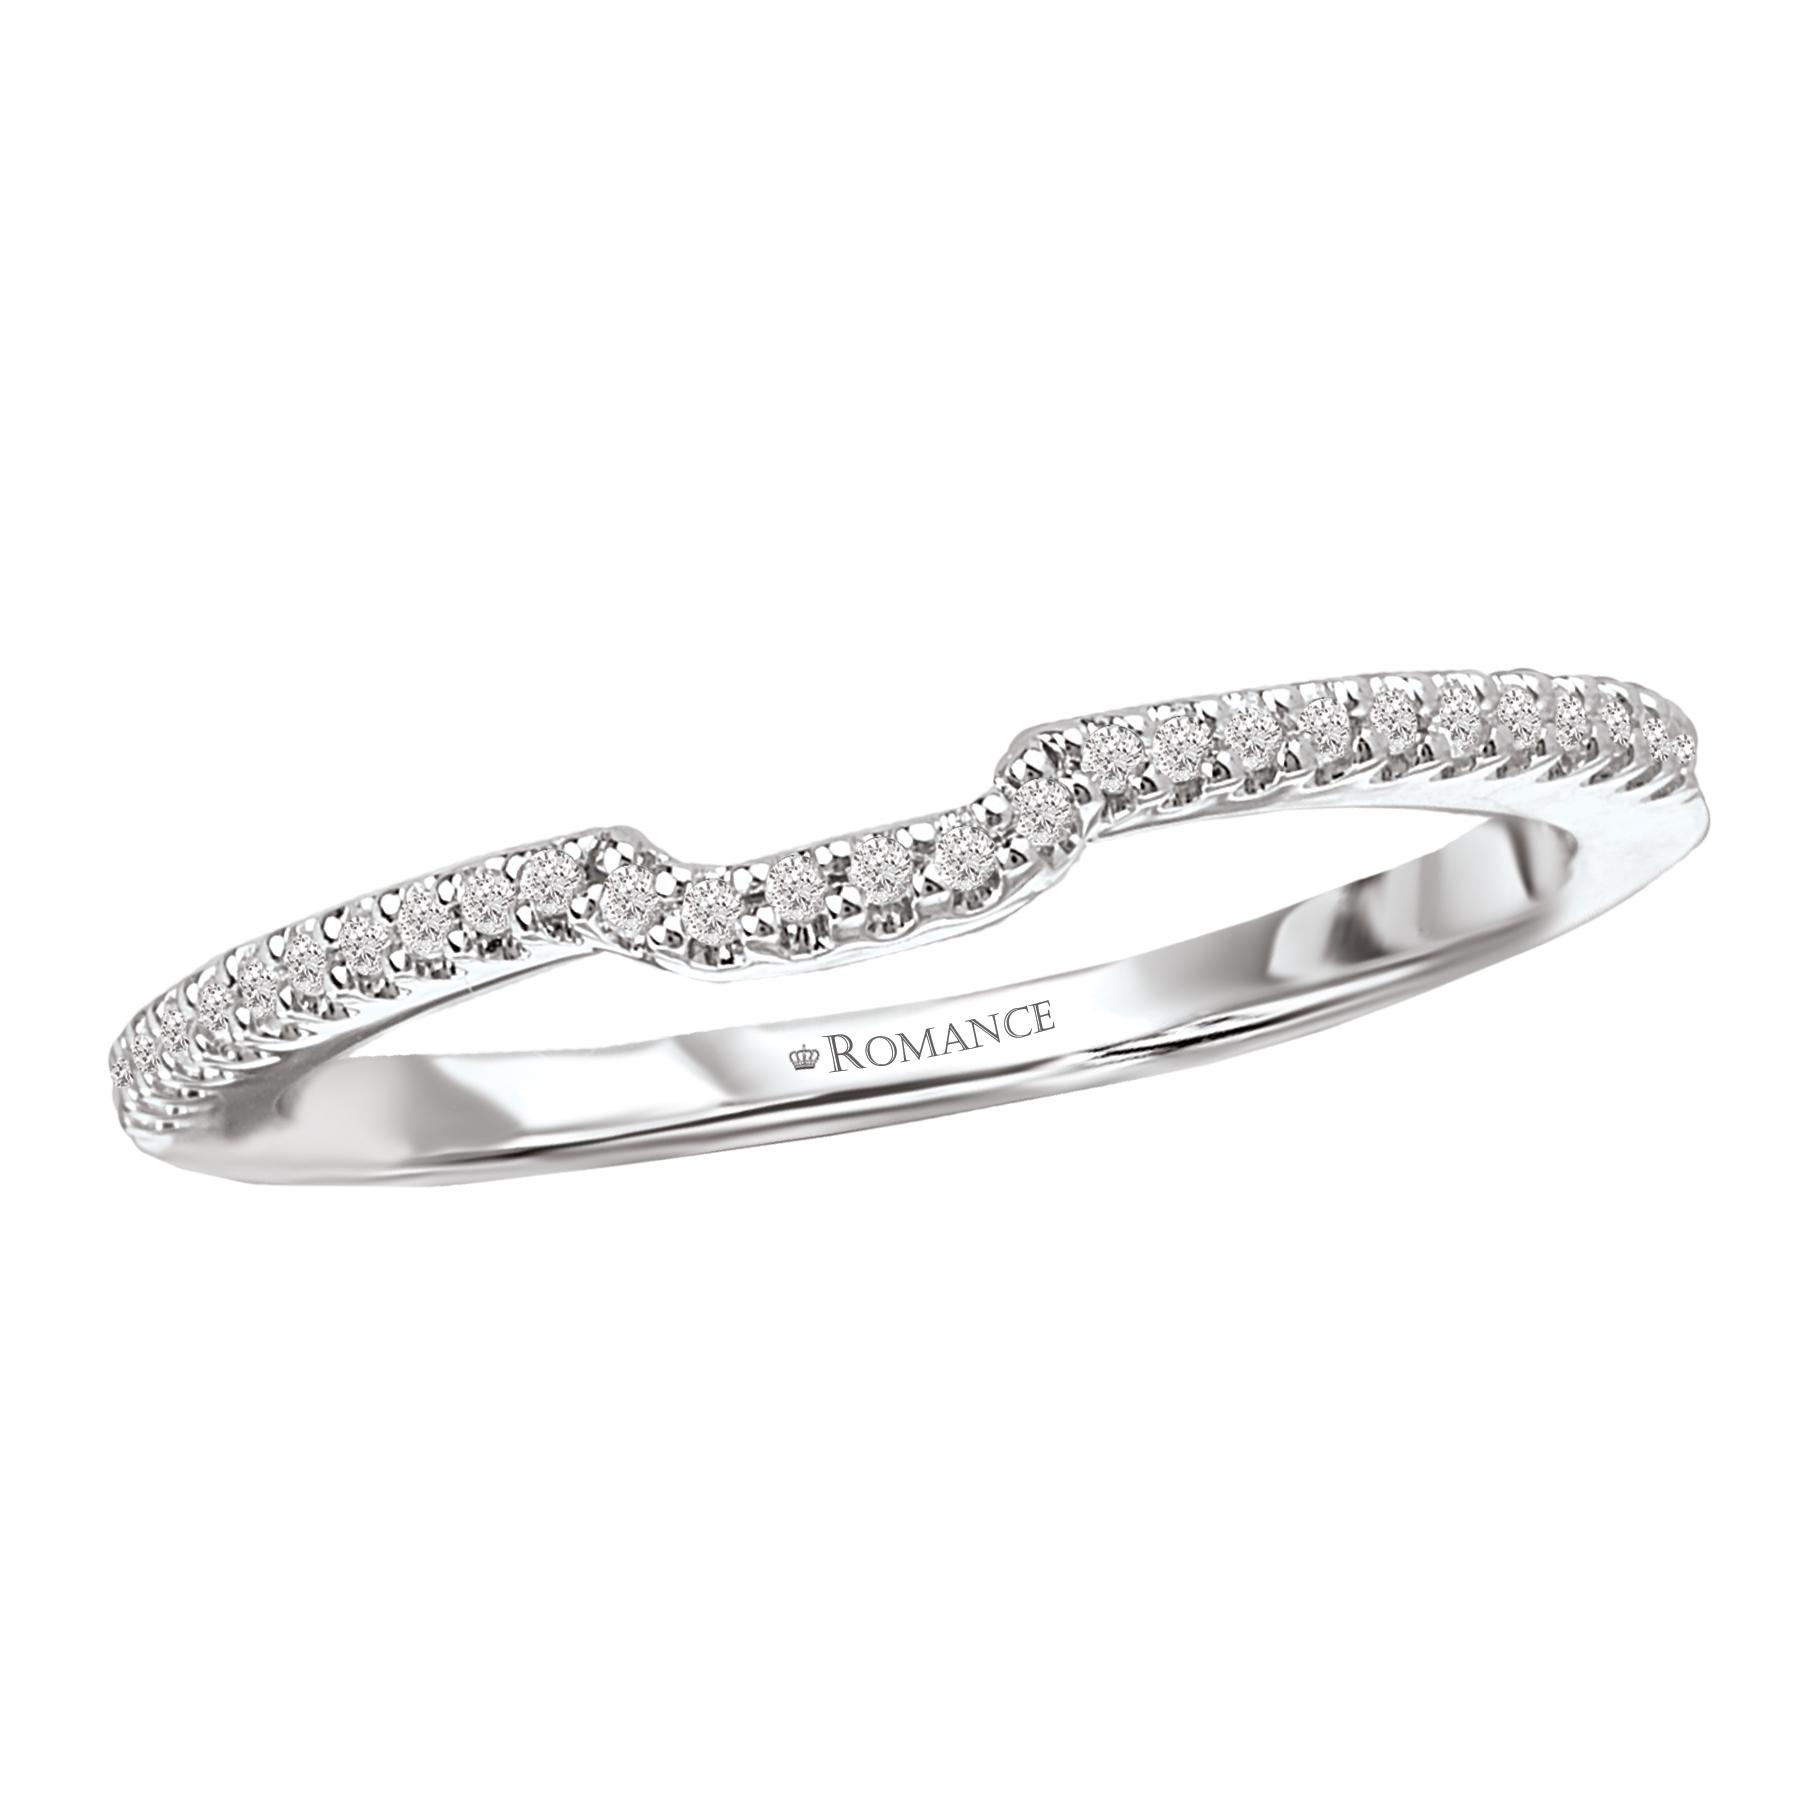 Romance Wedding Bands 117426-150W product image